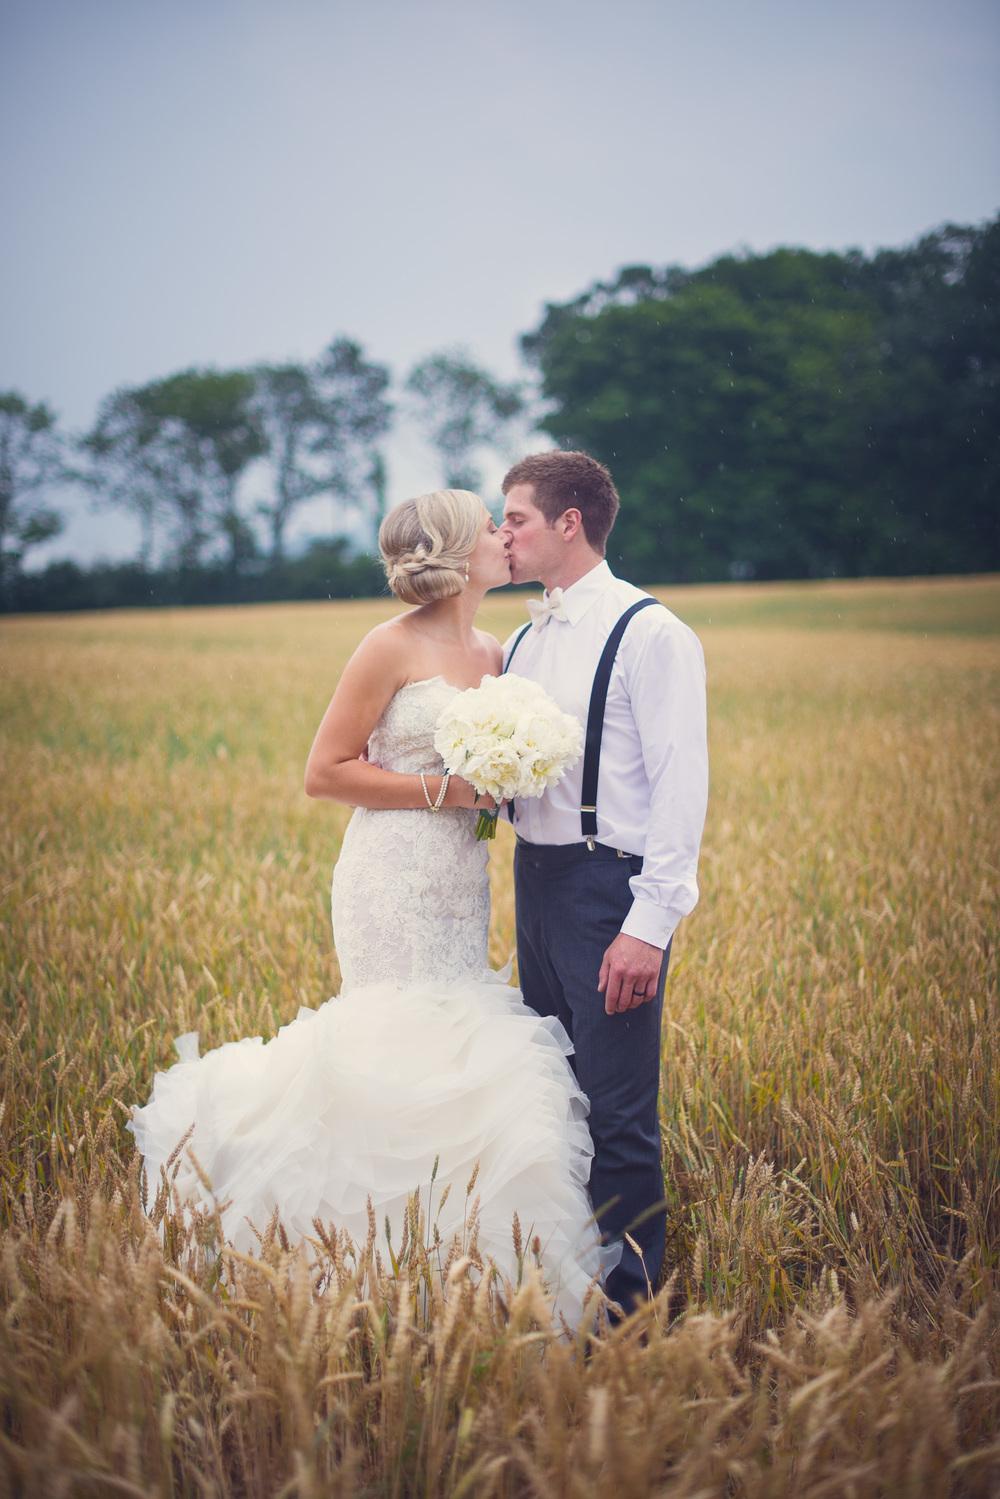 wedding open field bride groom couple husband wife portrait THPHOTO